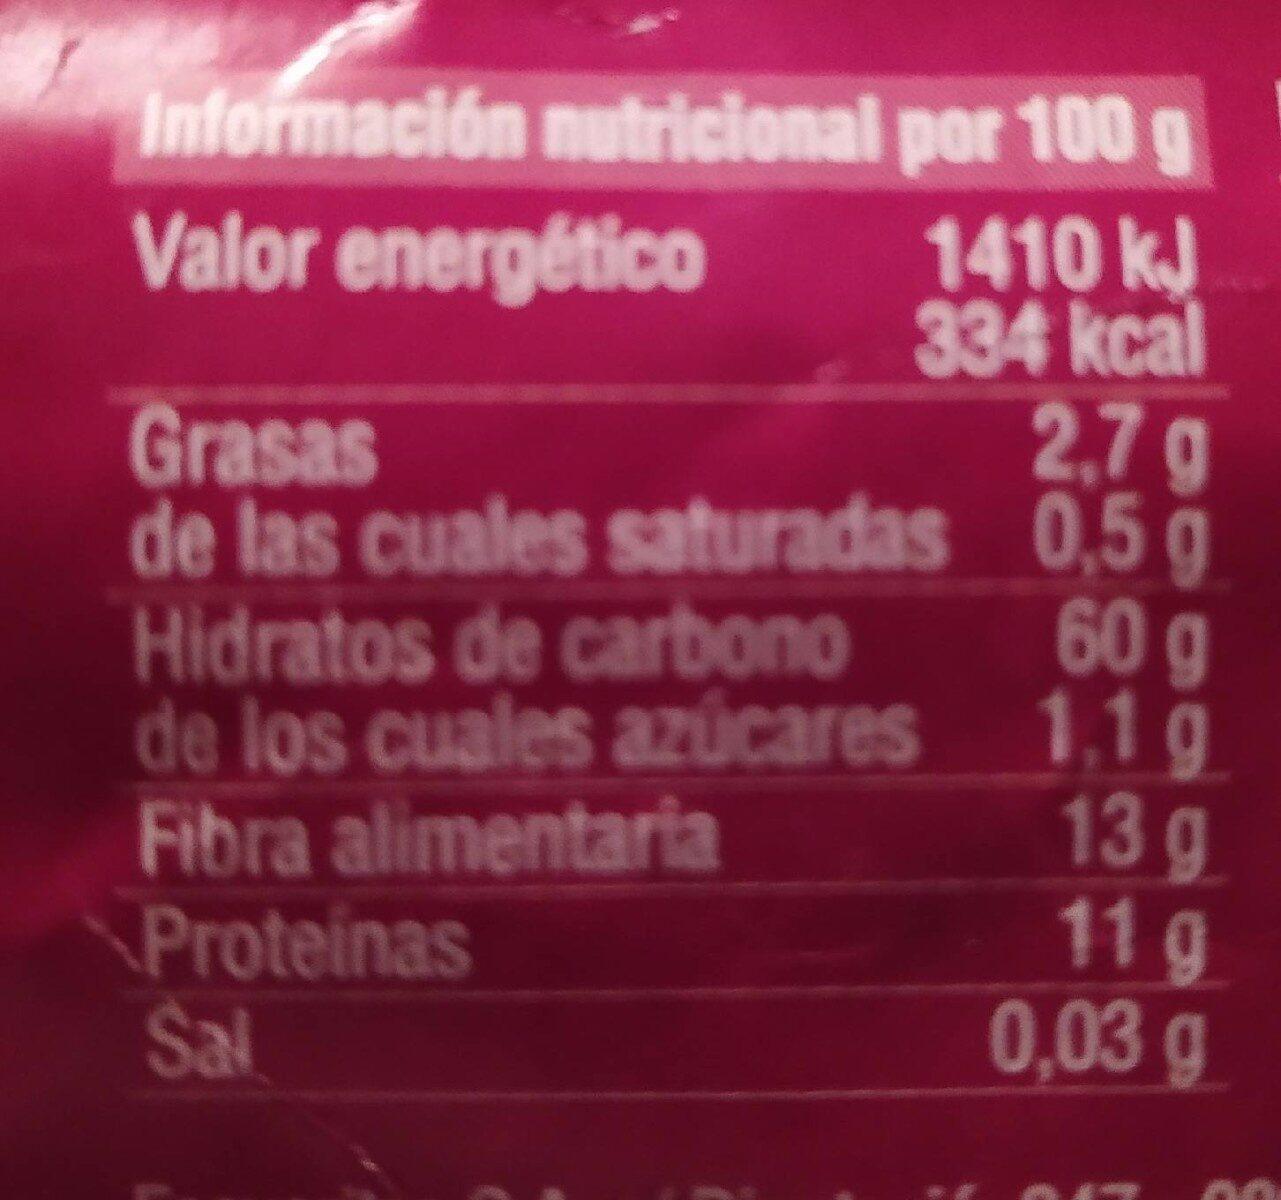 Copos 4 Cereales - Informations nutritionnelles - es